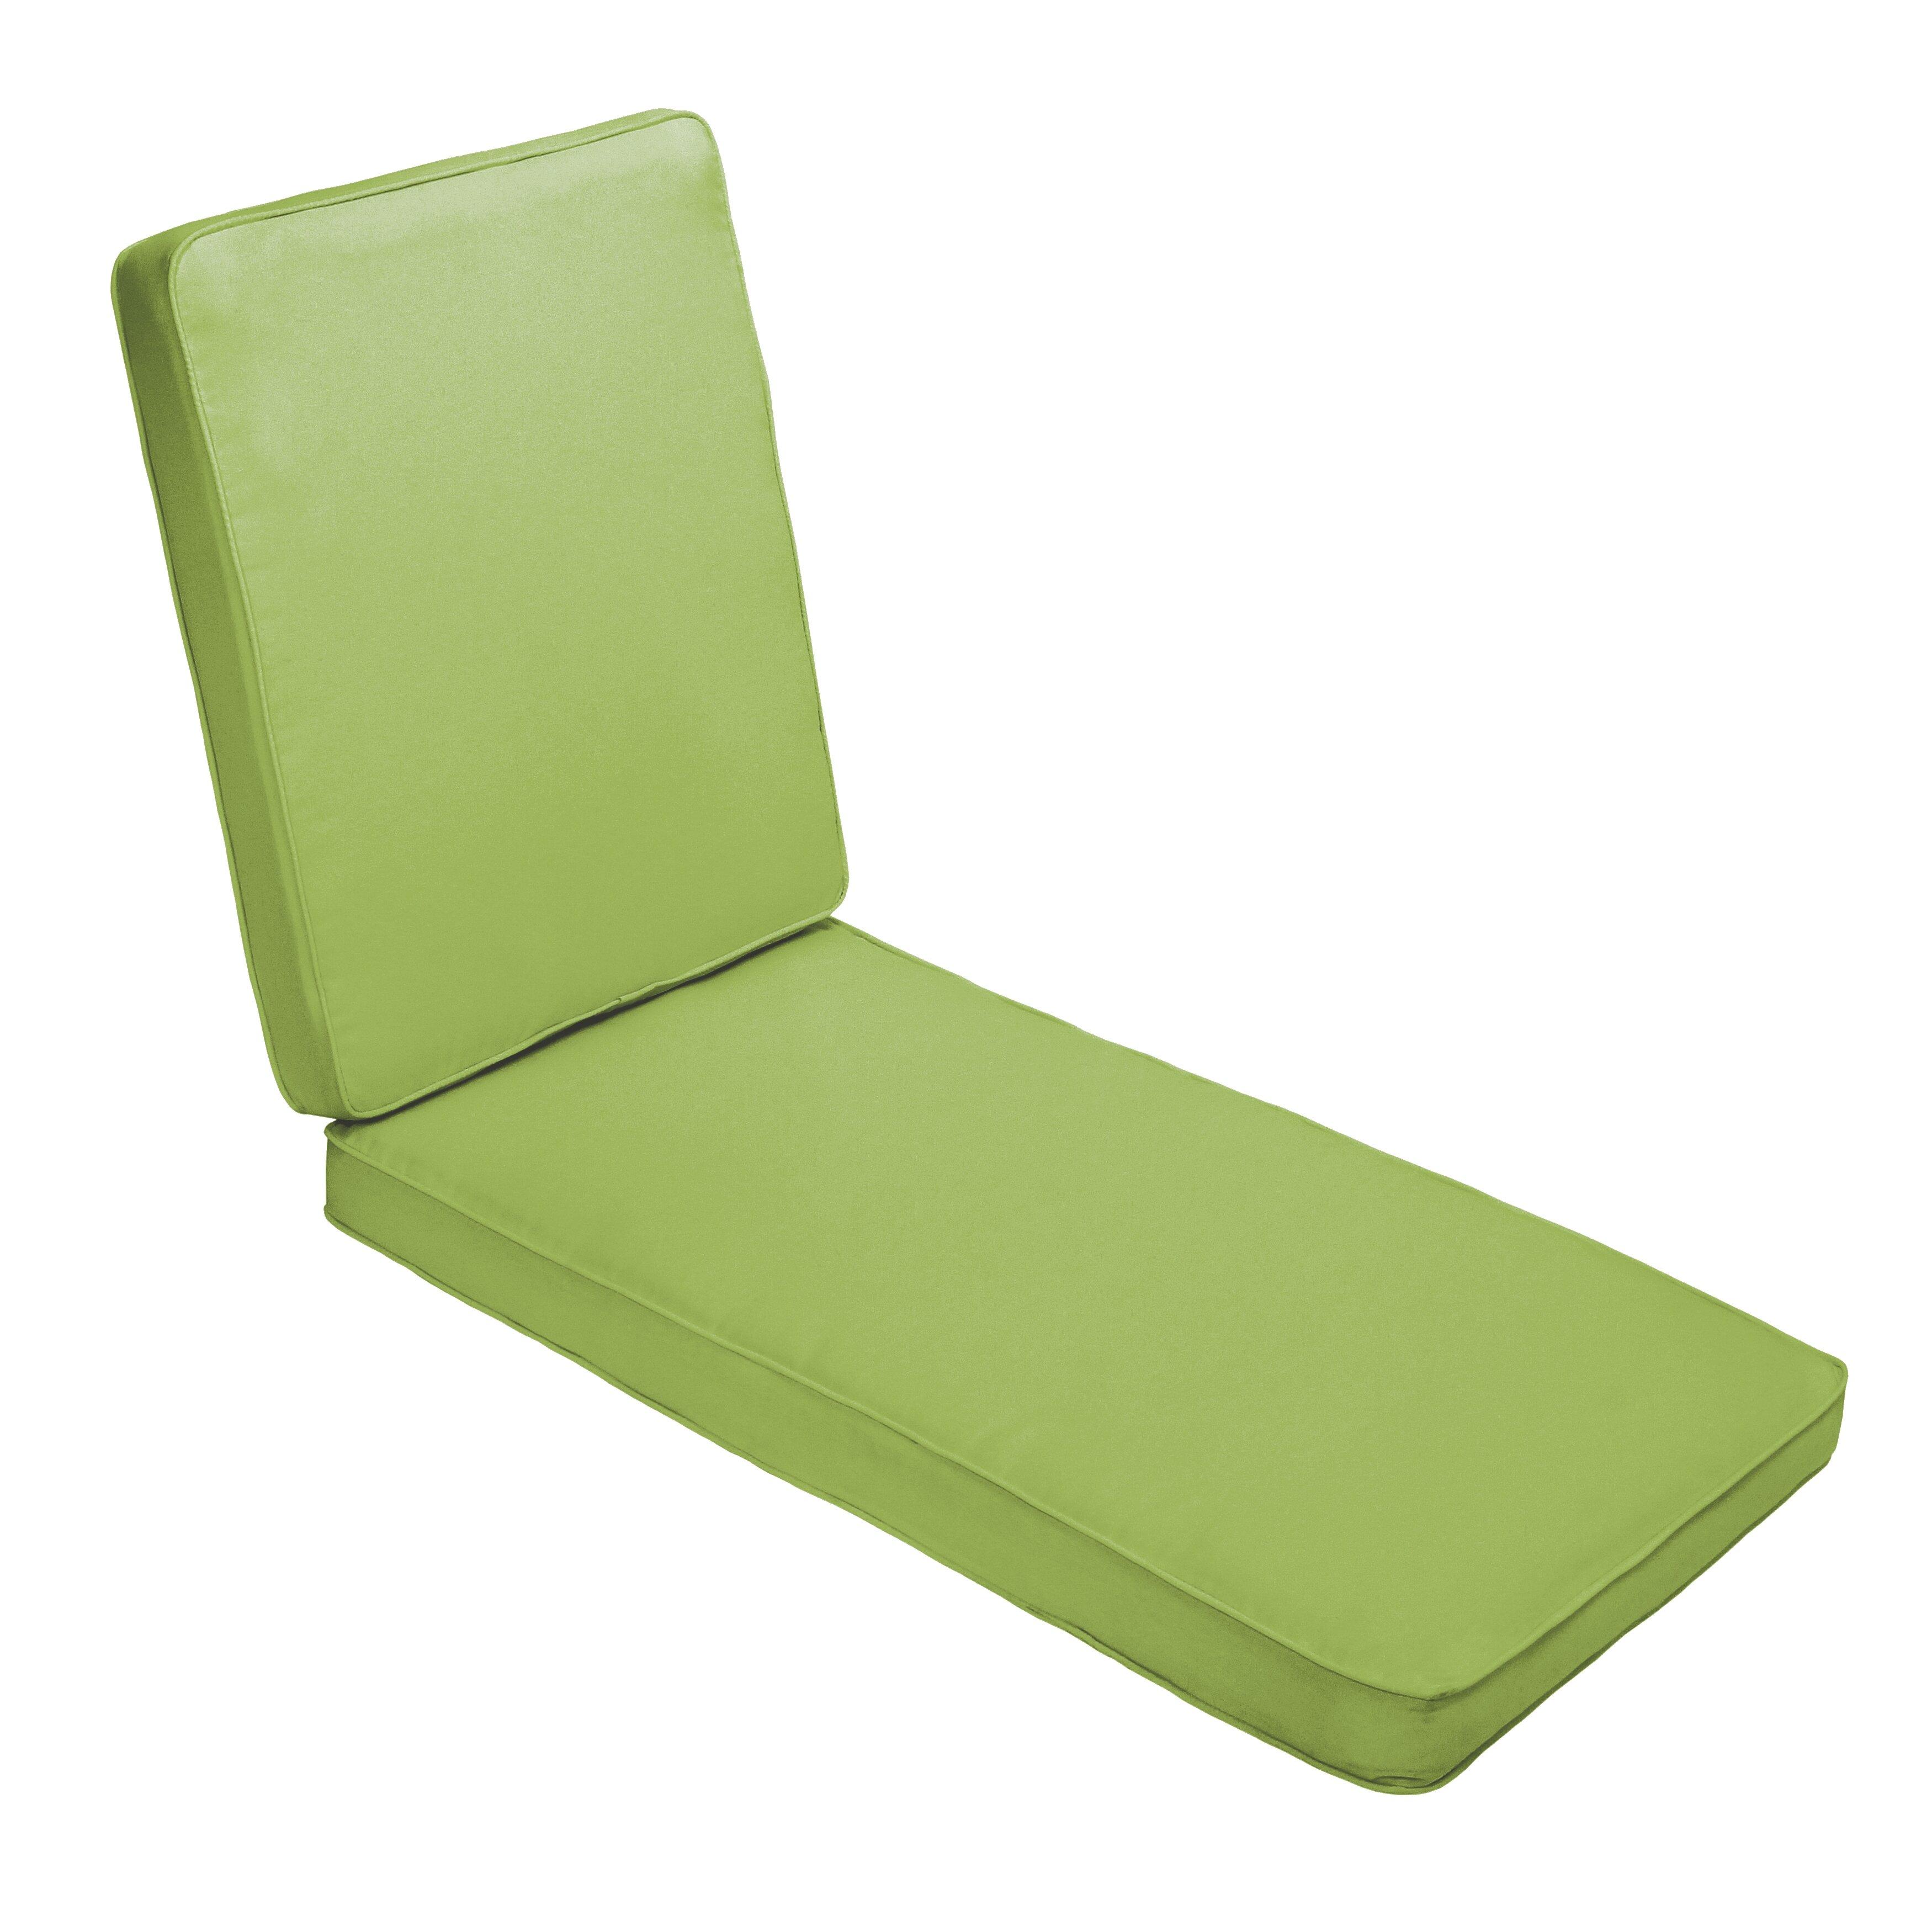 Le Outdoor Lounge Chair Cushion